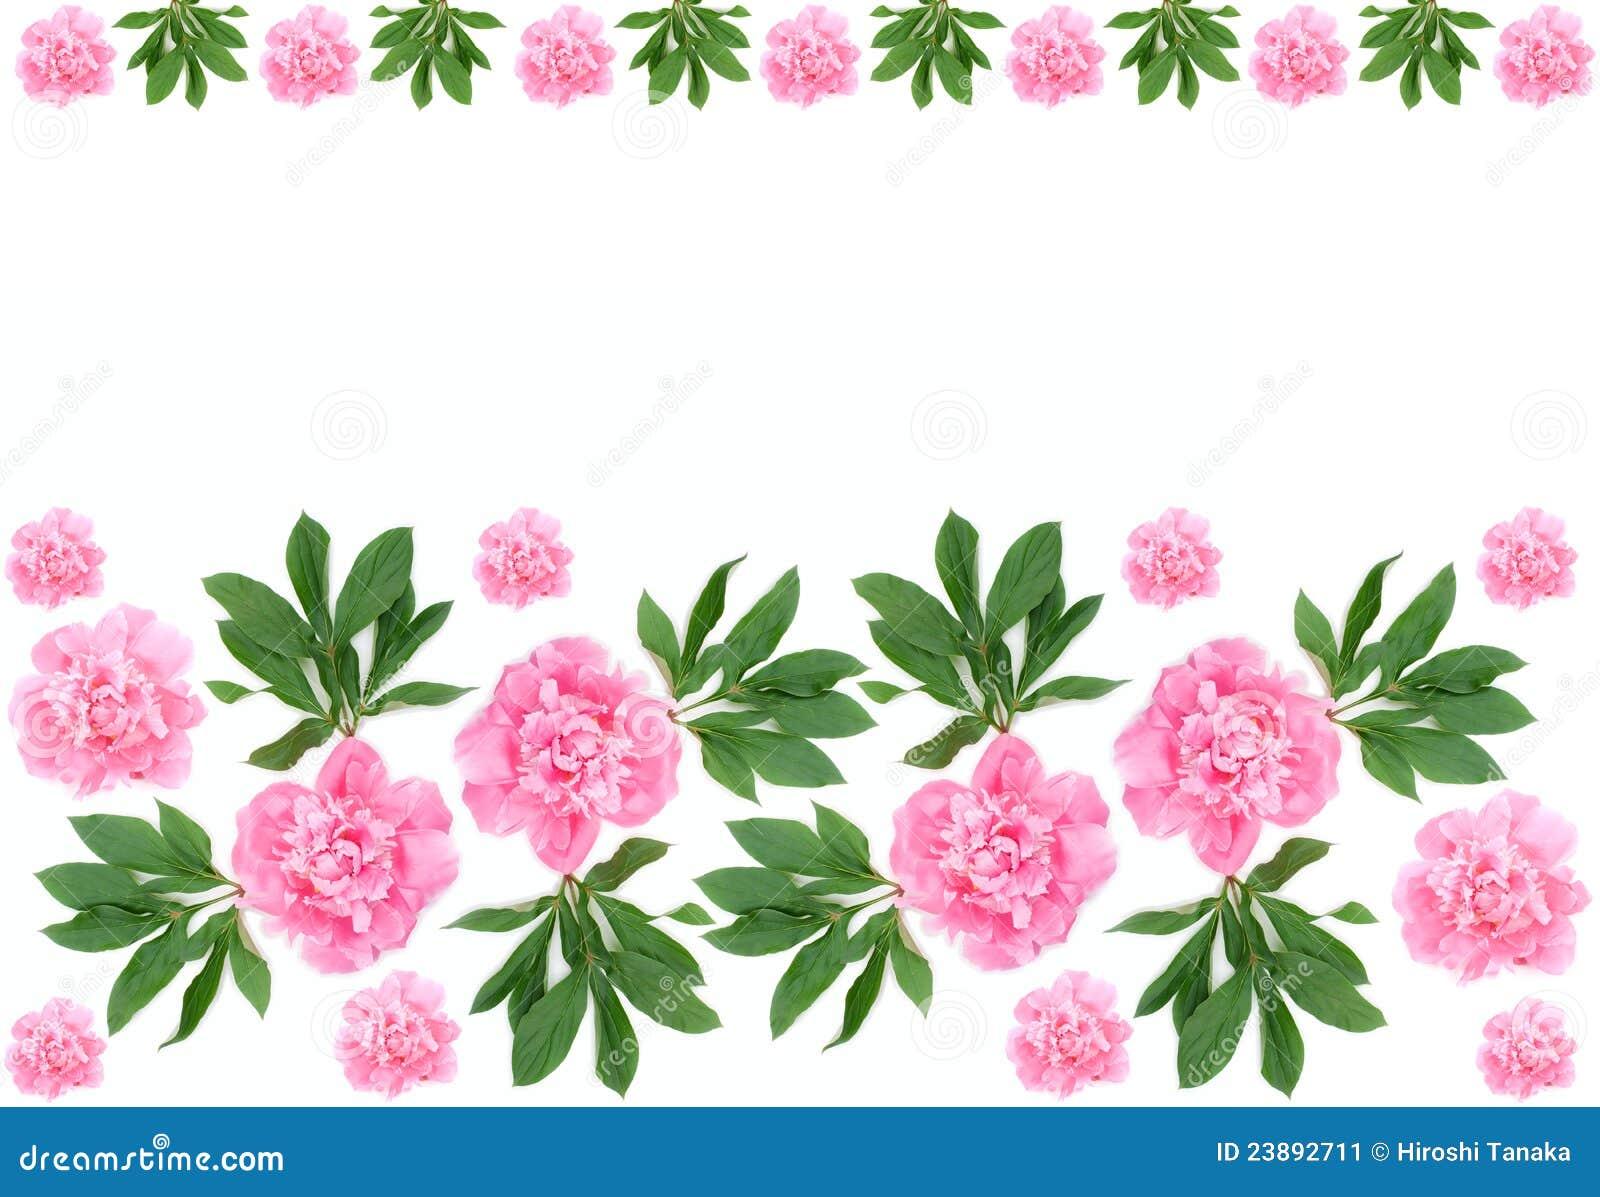 Peony flower isolated on white stock vector 368014568 shutterstock - Vector Peony Flower Isolated On White Stock 450x470 Peony Flowers Crochet Pattern By Jolanda Schneider 851x645 Peony